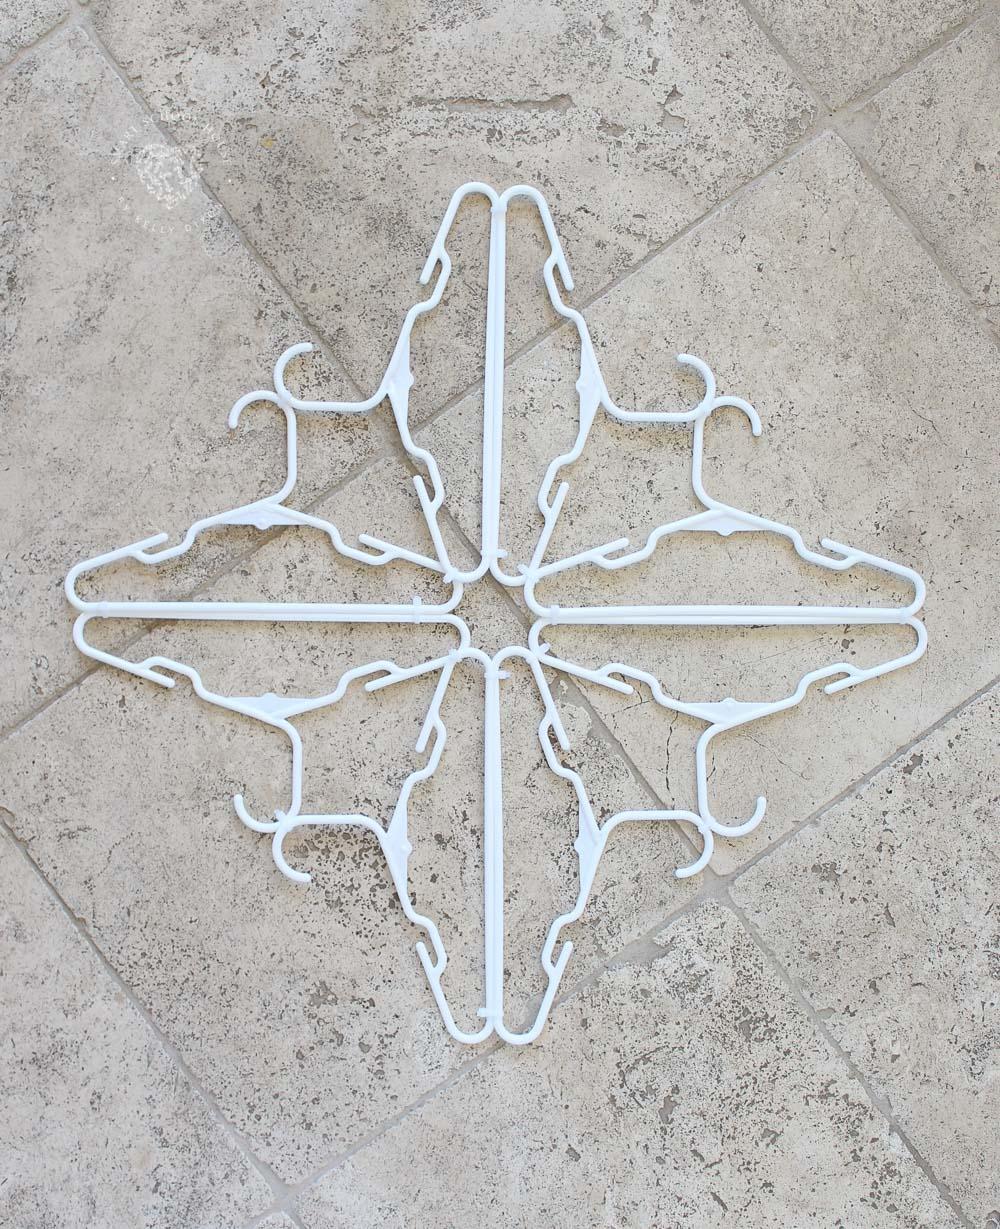 Hanger Snowflake Directions